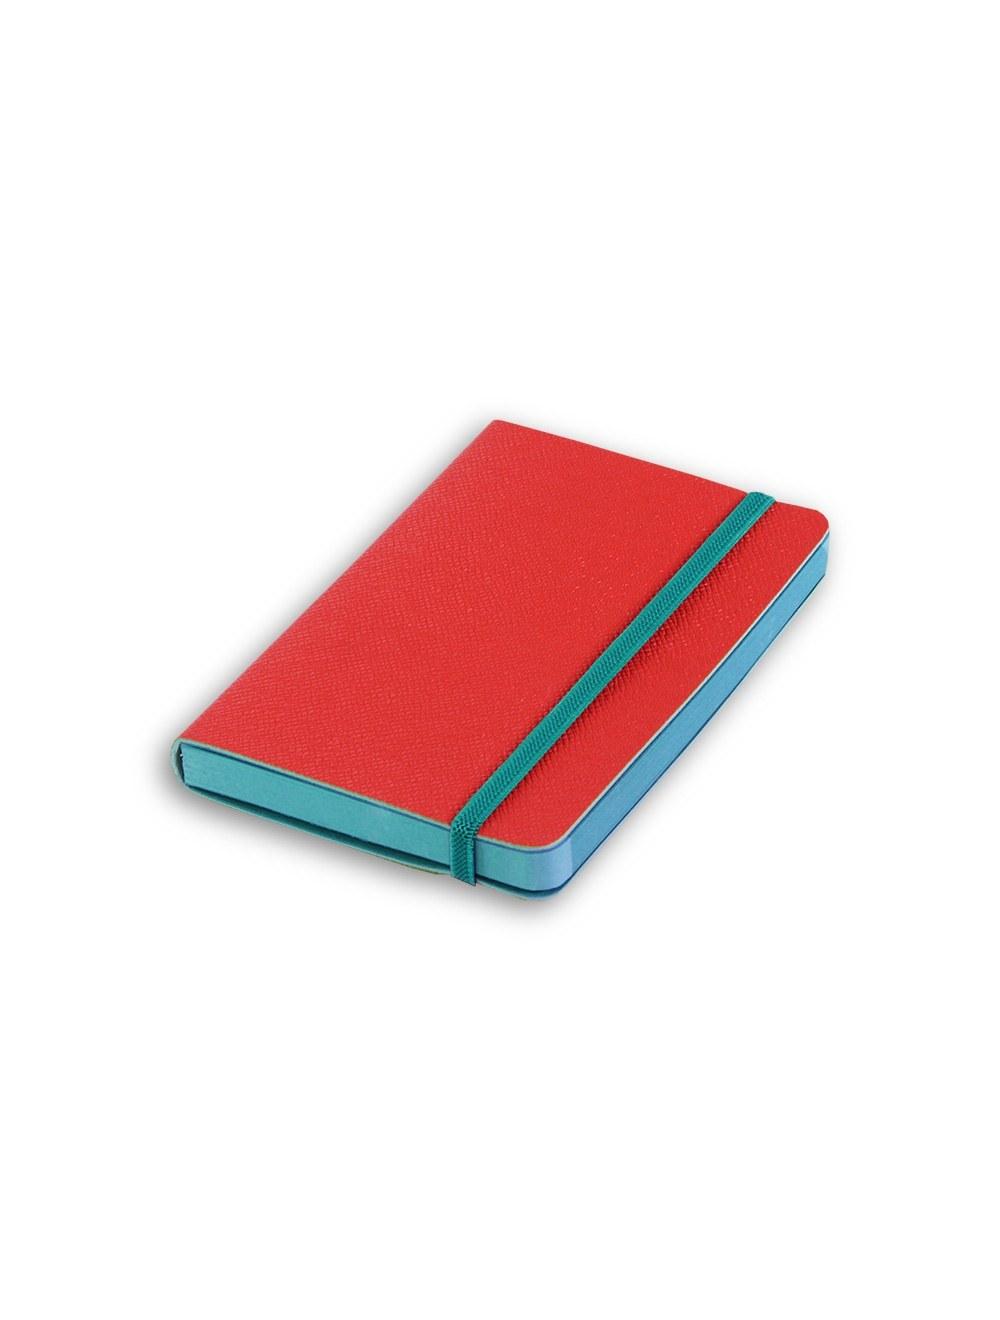 Elastic+ Journal 9 X 14 Cm - Coloured Internal Paper